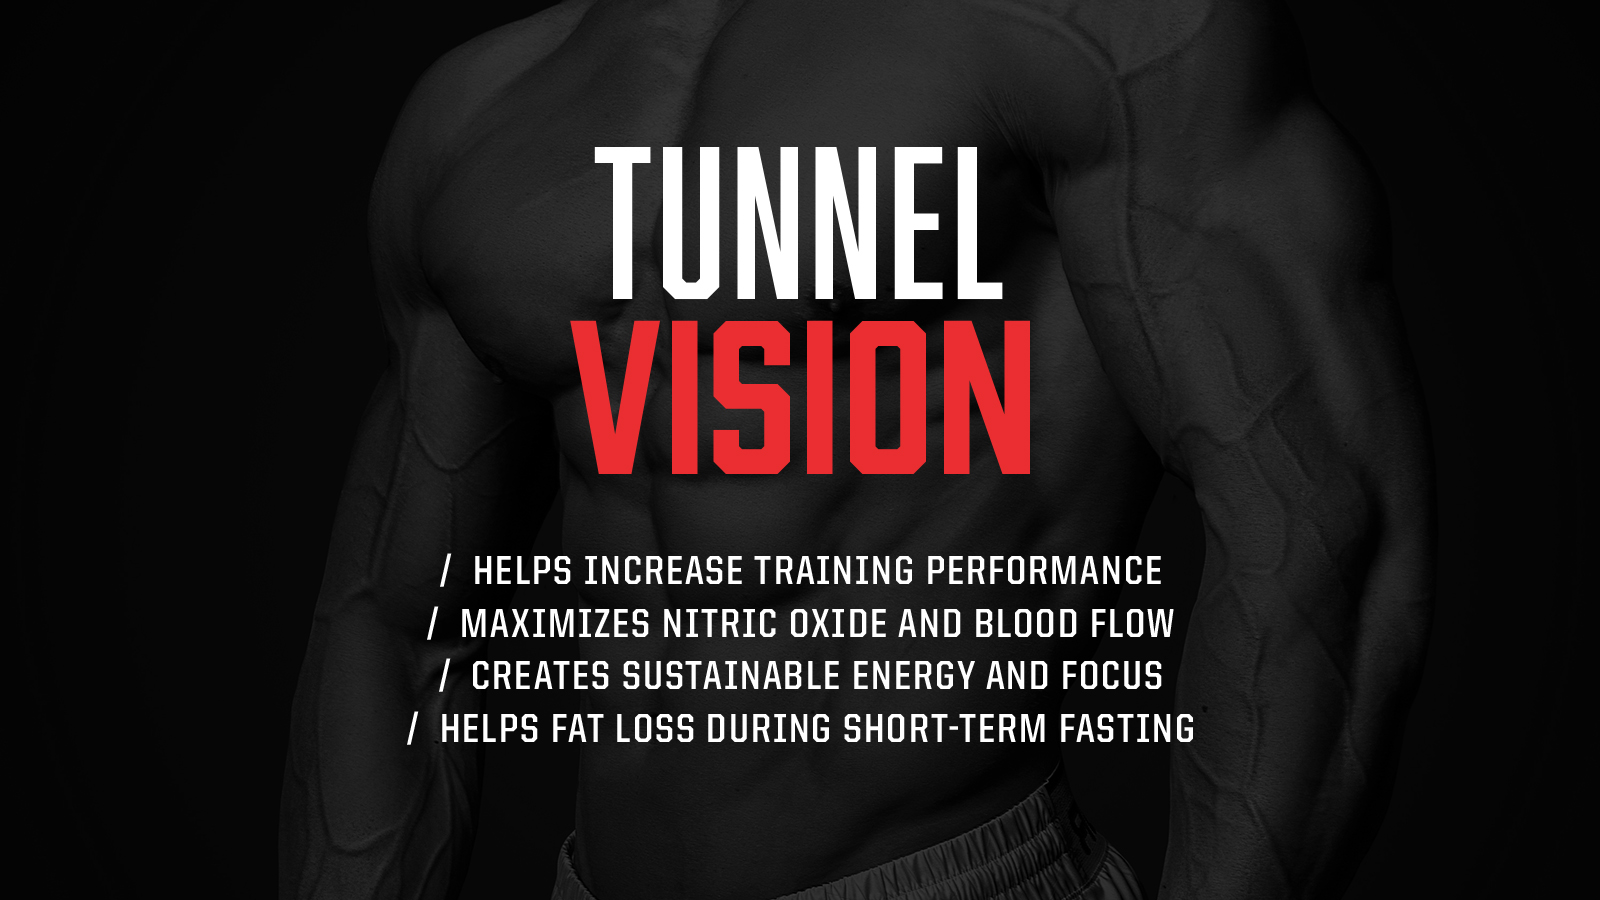 Rotator_Banners_TunnelVision.jpg